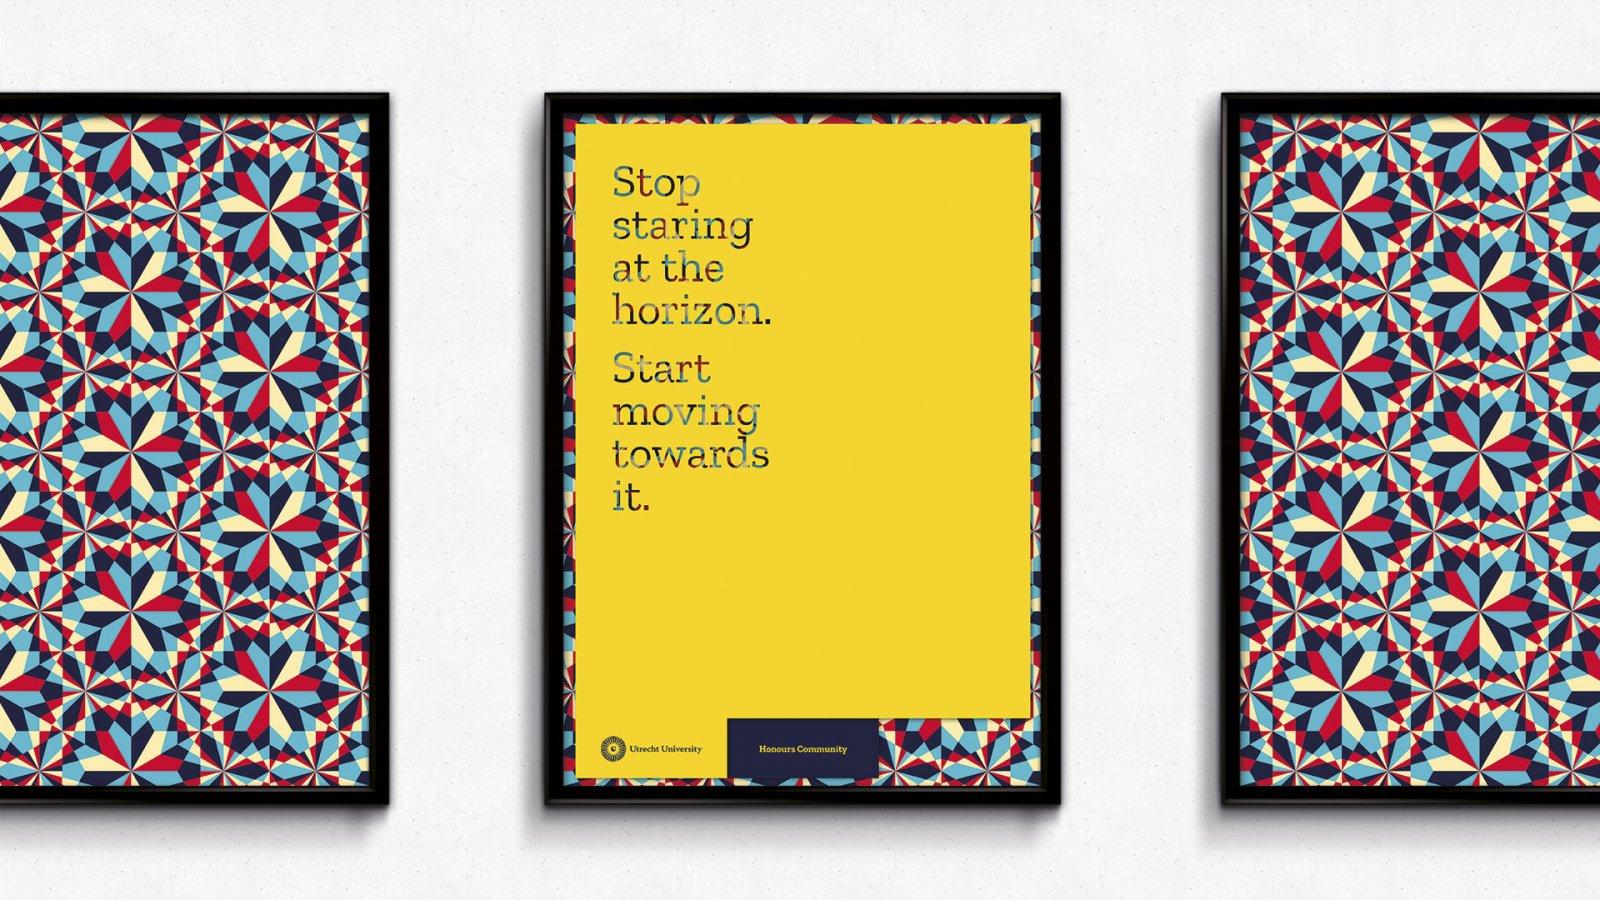 Honours Community, posters